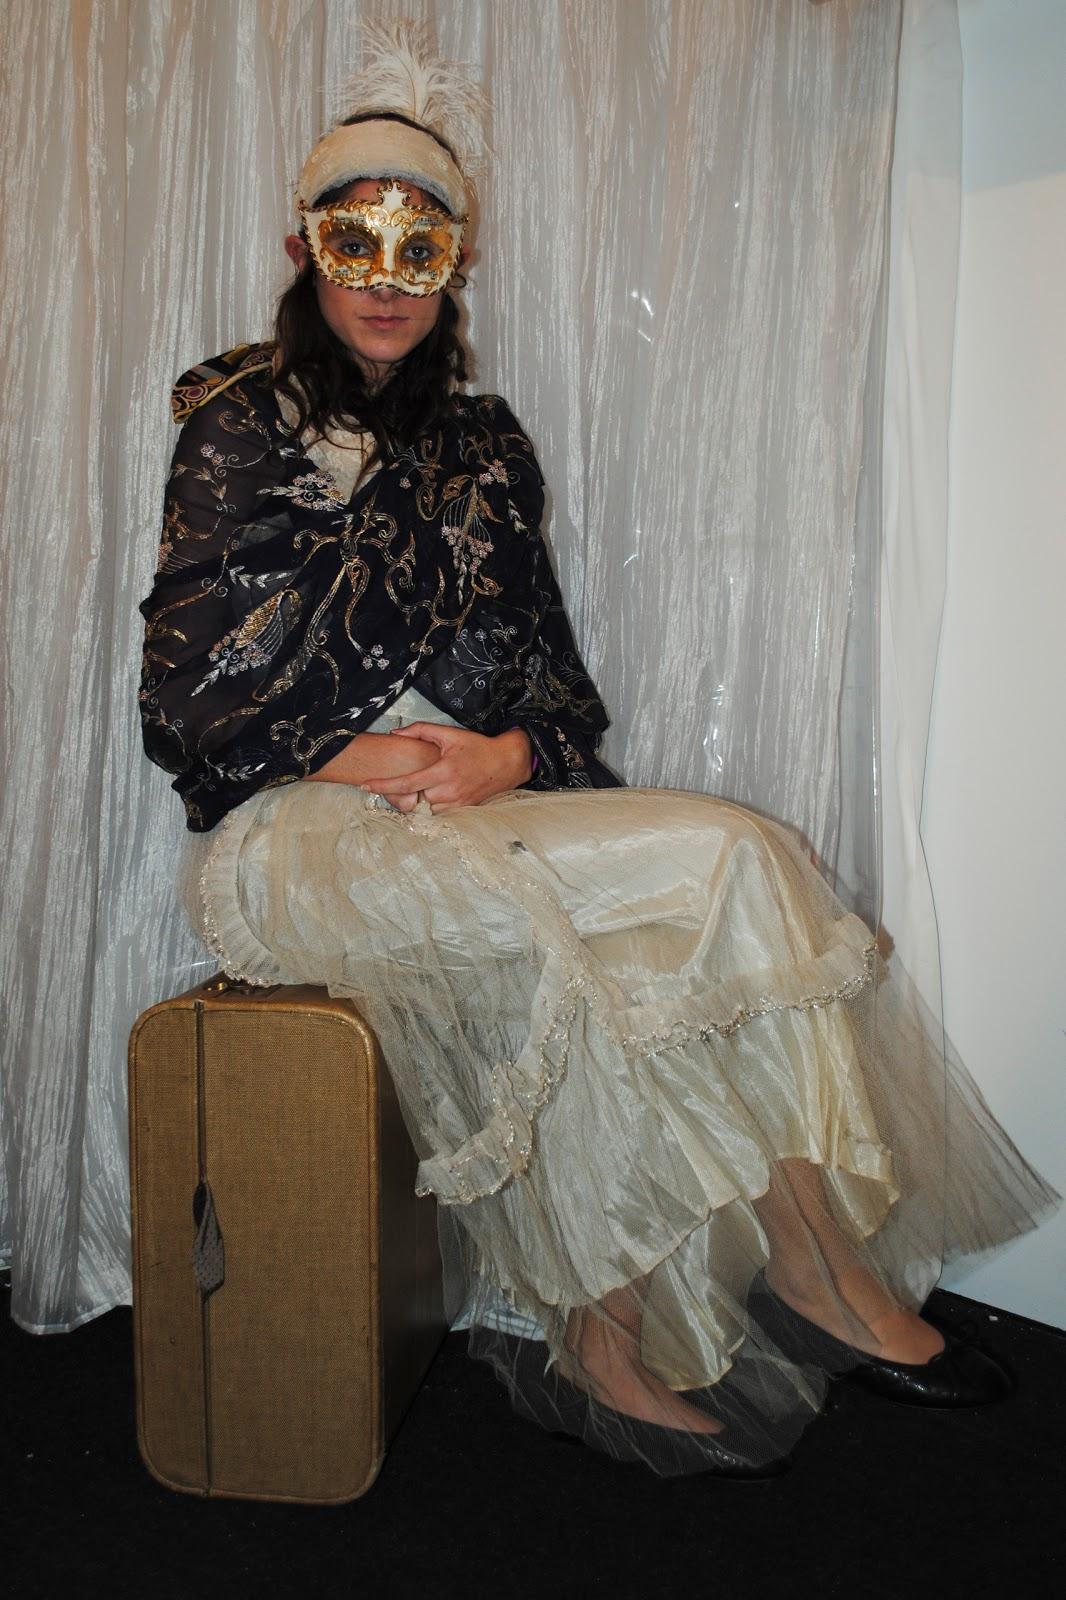 http://3.bp.blogspot.com/_R5AOi_Z2GmY/TOXHBpiKZ6I/AAAAAAAAAEY/3qHEND_5-8Y/s1600/Anastasia-+Gypsy+Princess+by+Chelsea+Morrison.jpg